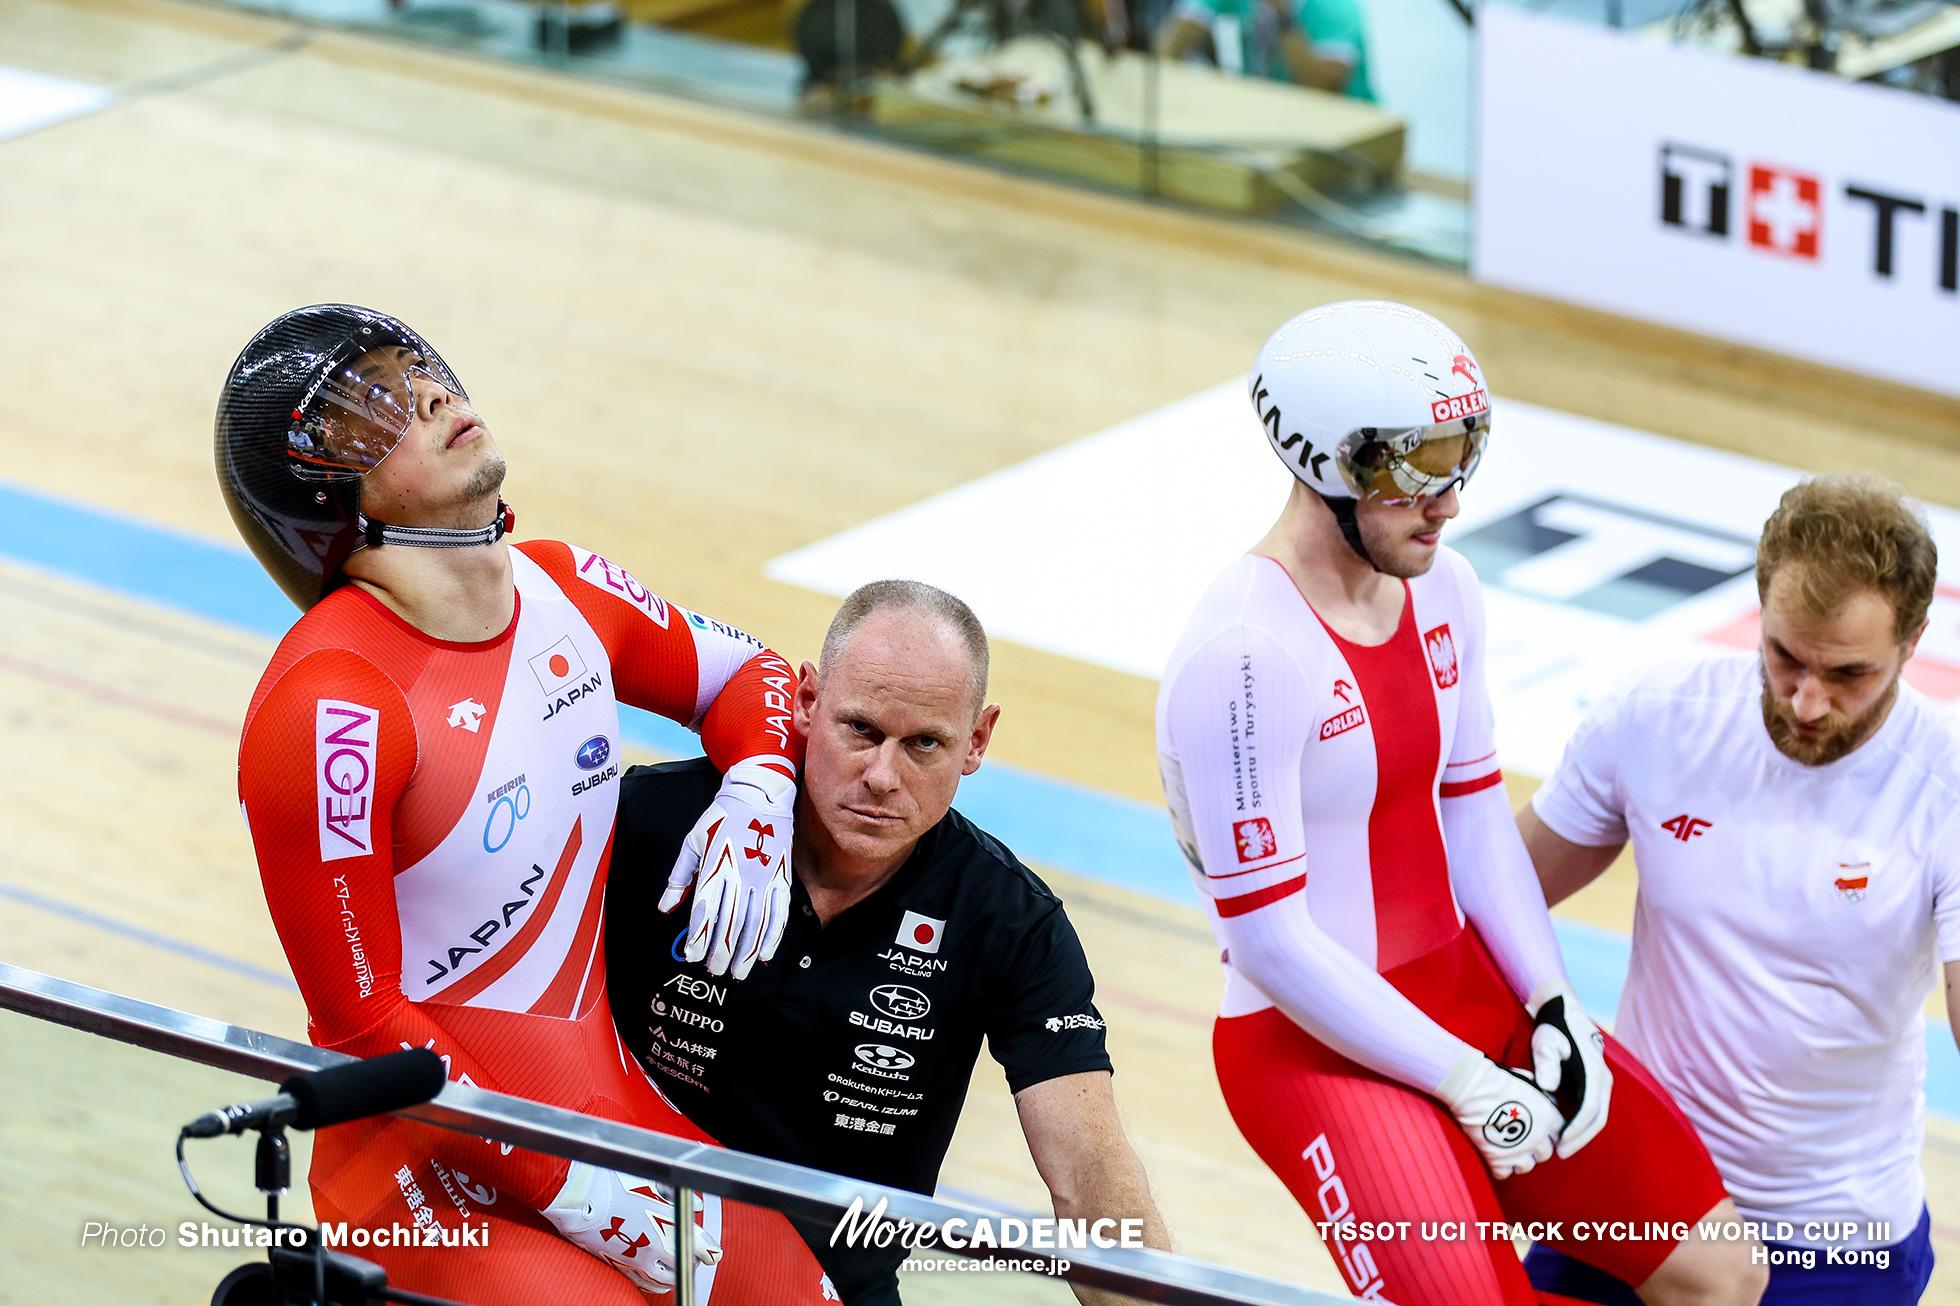 Final / Men's Sprint / TISSOT UCI TRACK CYCLING WORLD CUP III, Hong Kong, 深谷知広 Mateusz Rudyk マテウス・ルディク